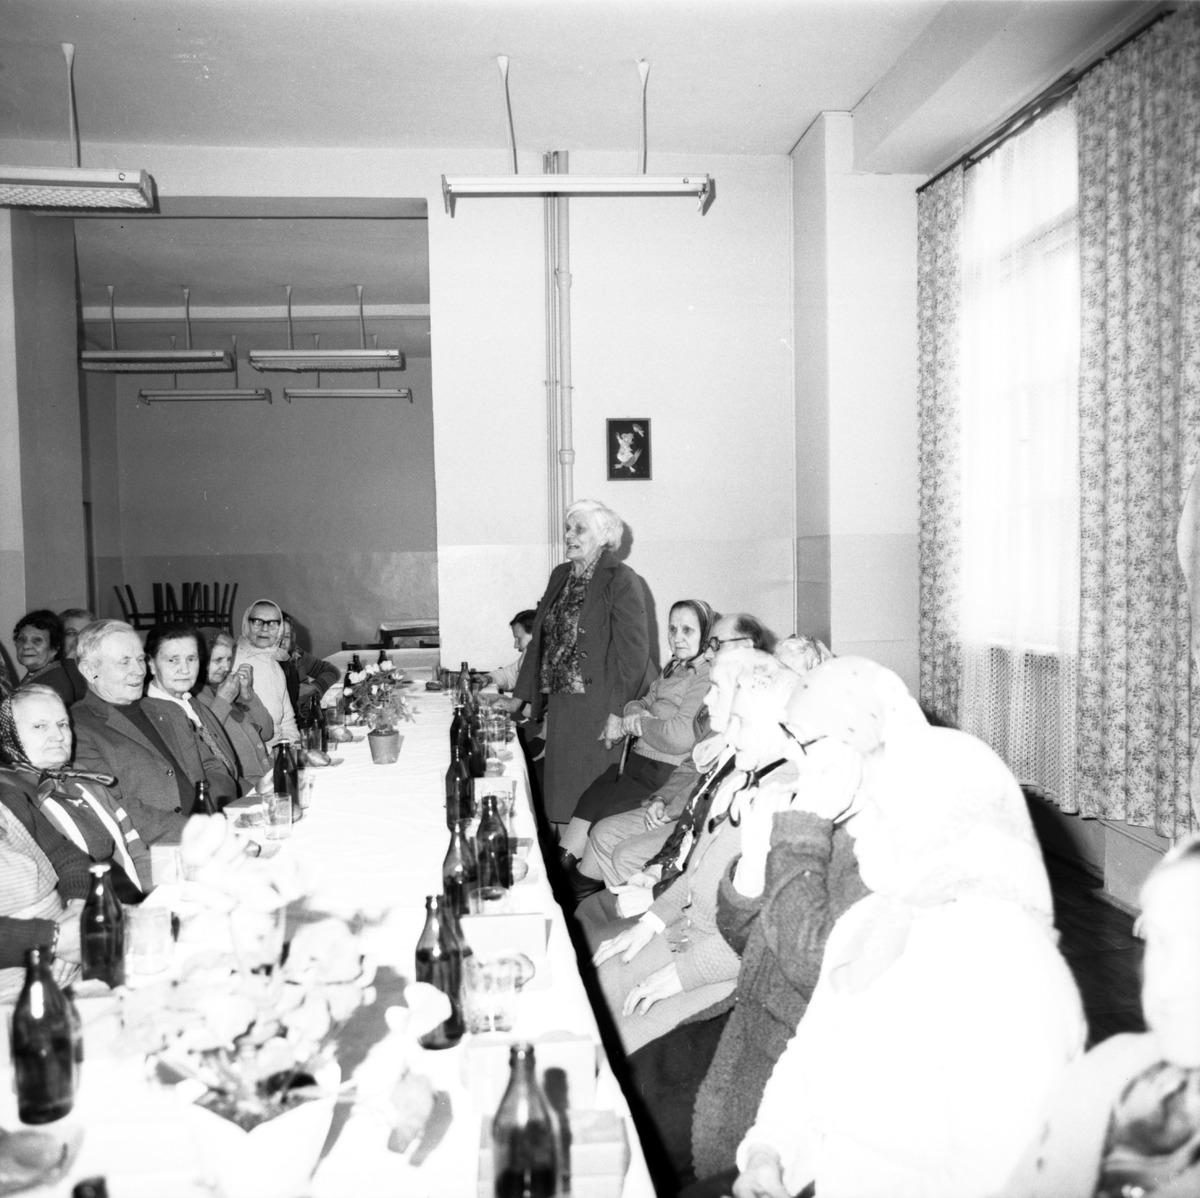 Obchody Dnia Seniora, 1986 r. [2]